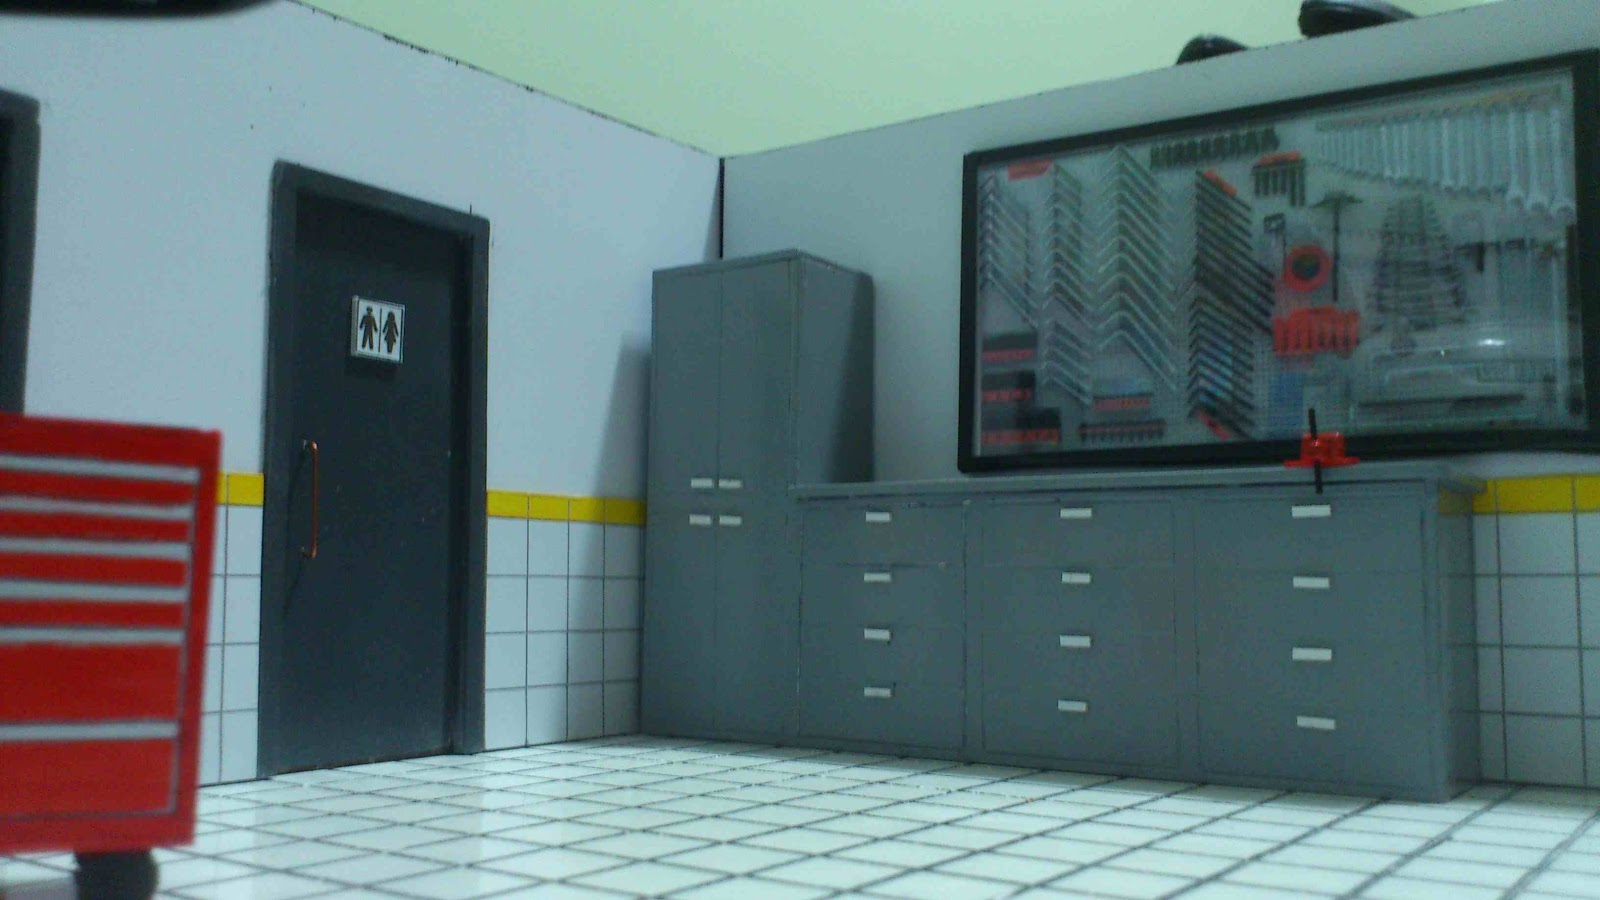 POLO MINIATURAS: Diorama Oficina Mecânica #7C7C14 1600x900